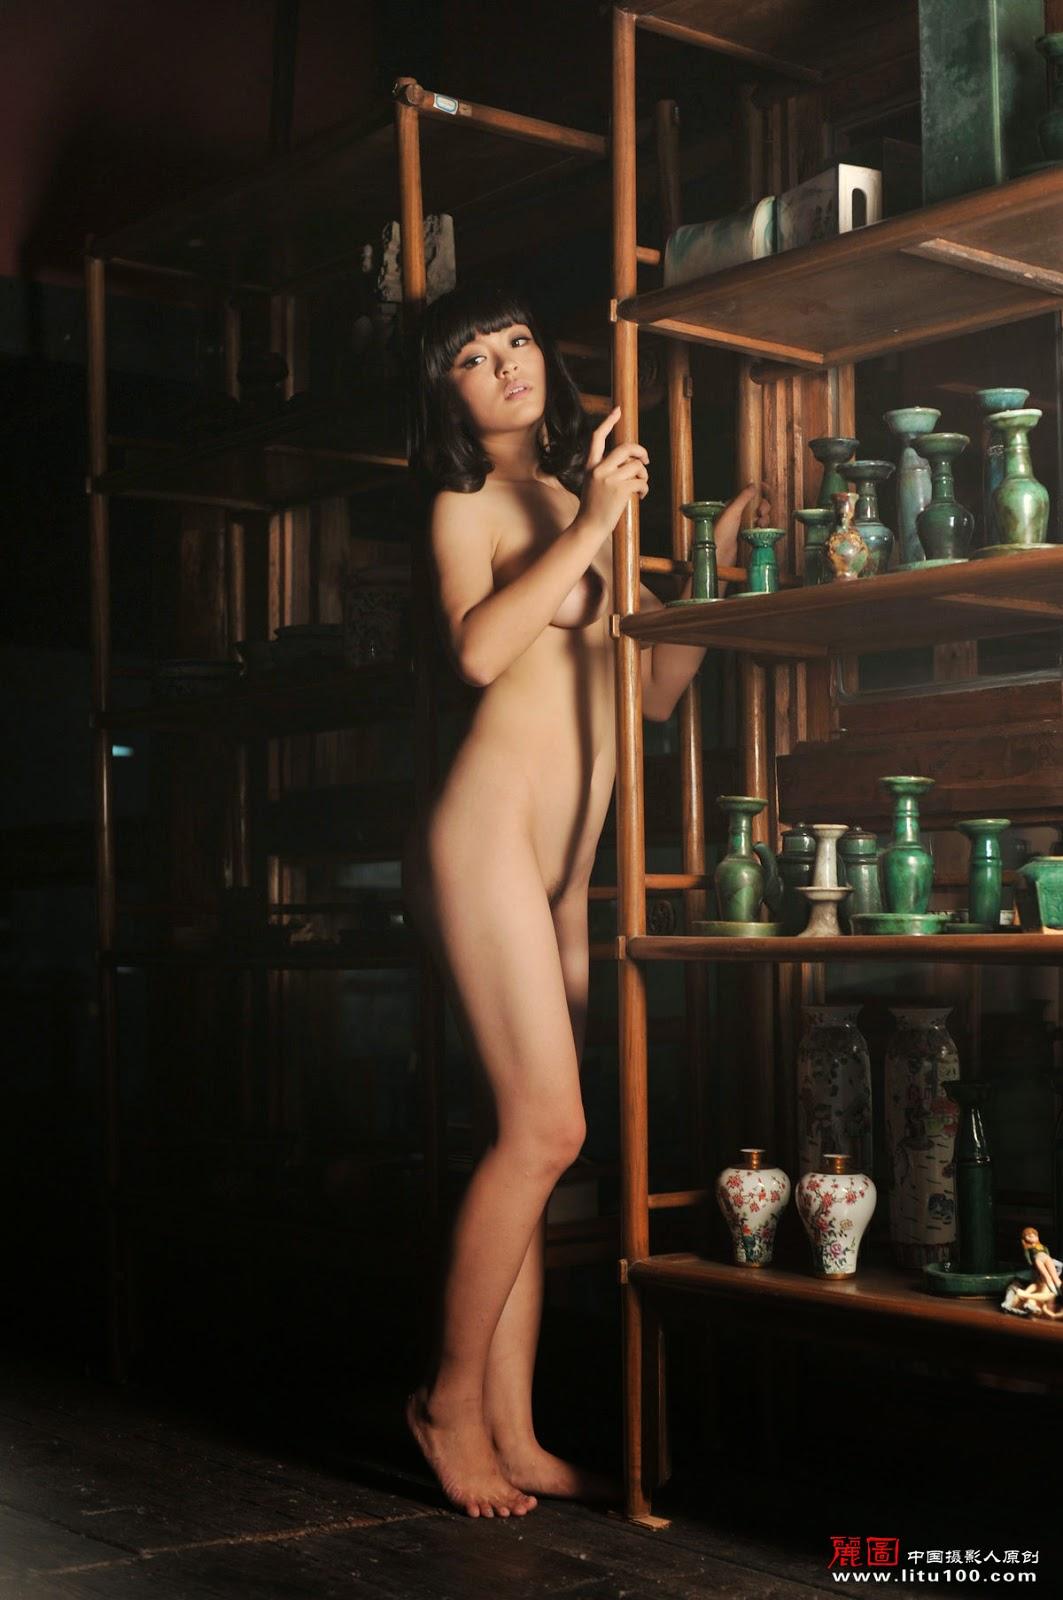 DSC 7262 - Chinese Nude Model Su Quan [Litu100]   18+ gallery photos